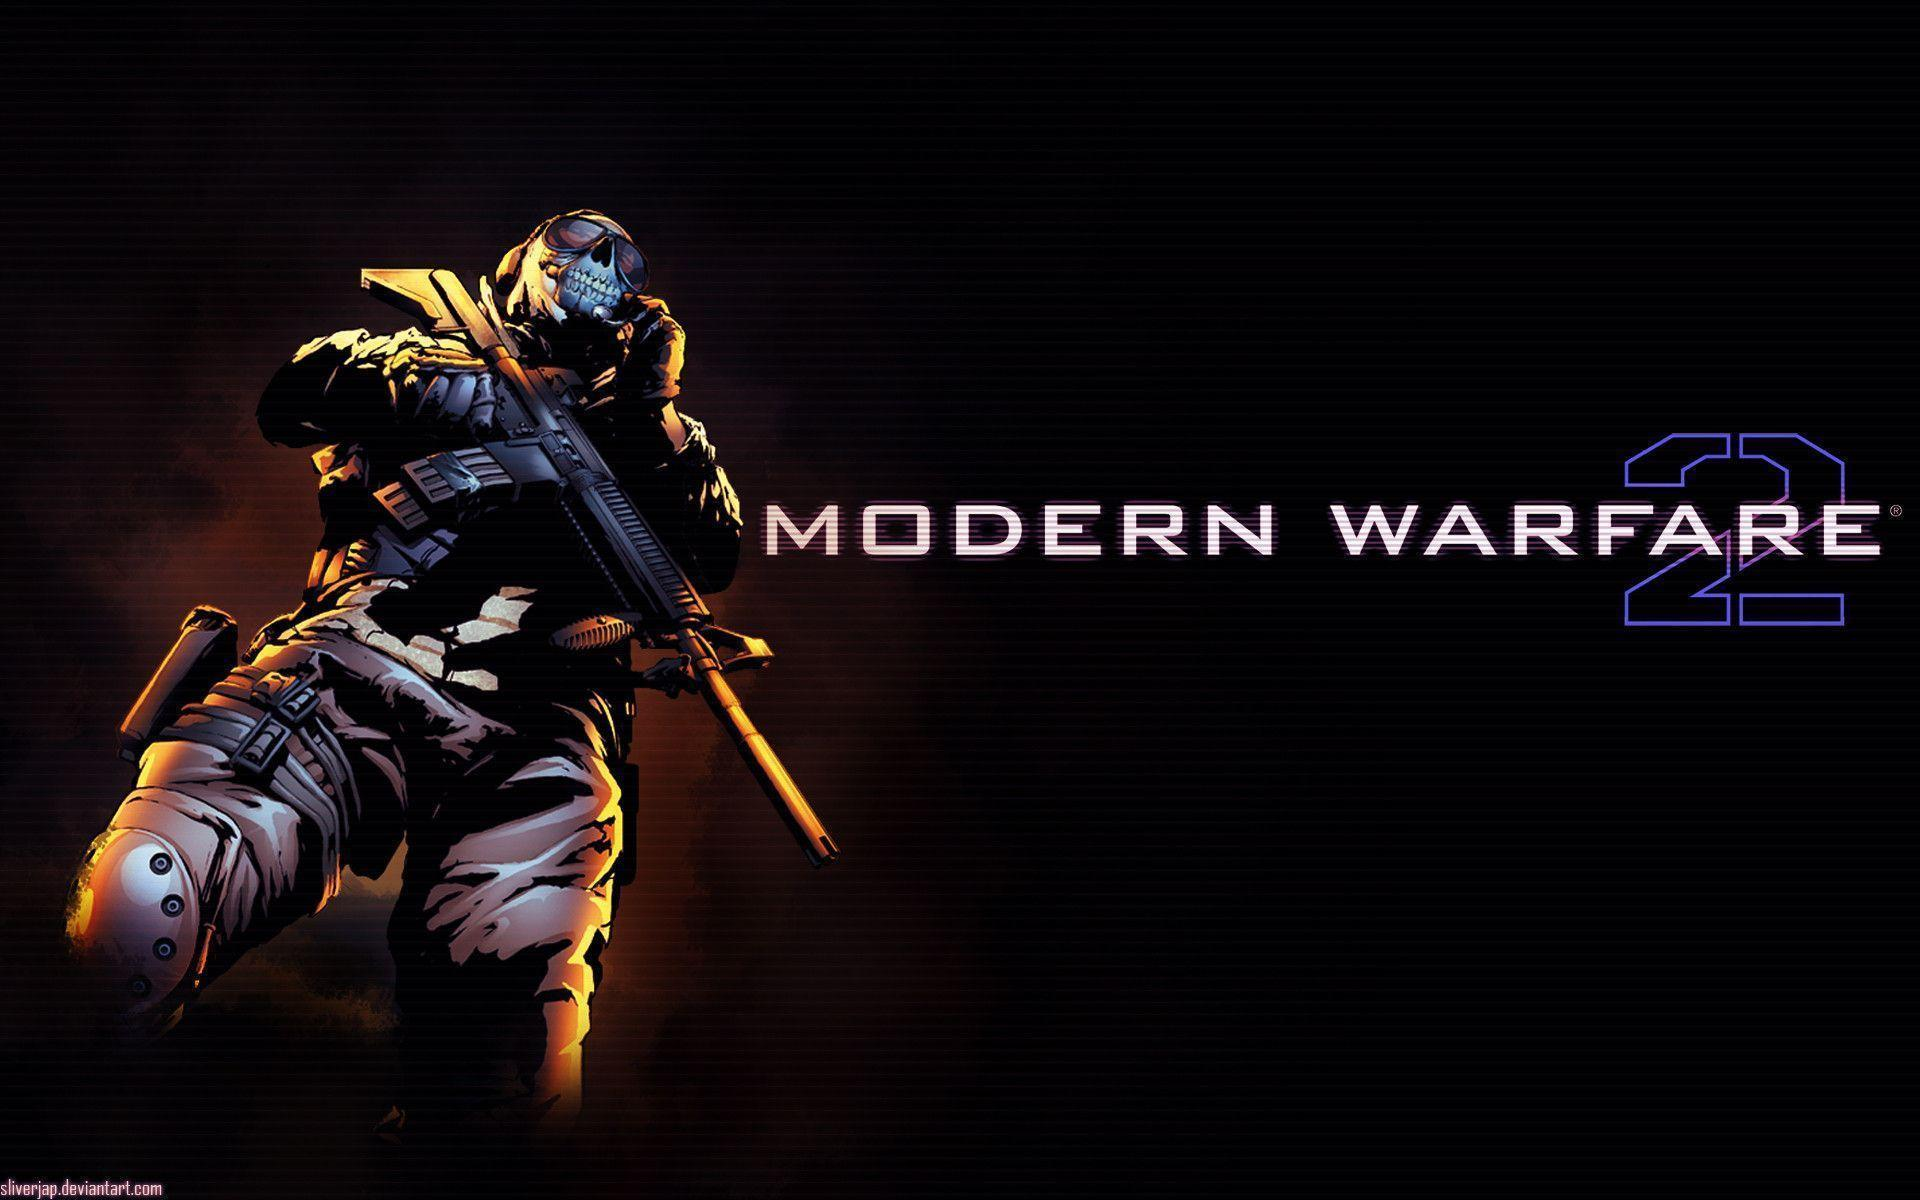 Call of duty modern warfare 2 matchmaking service